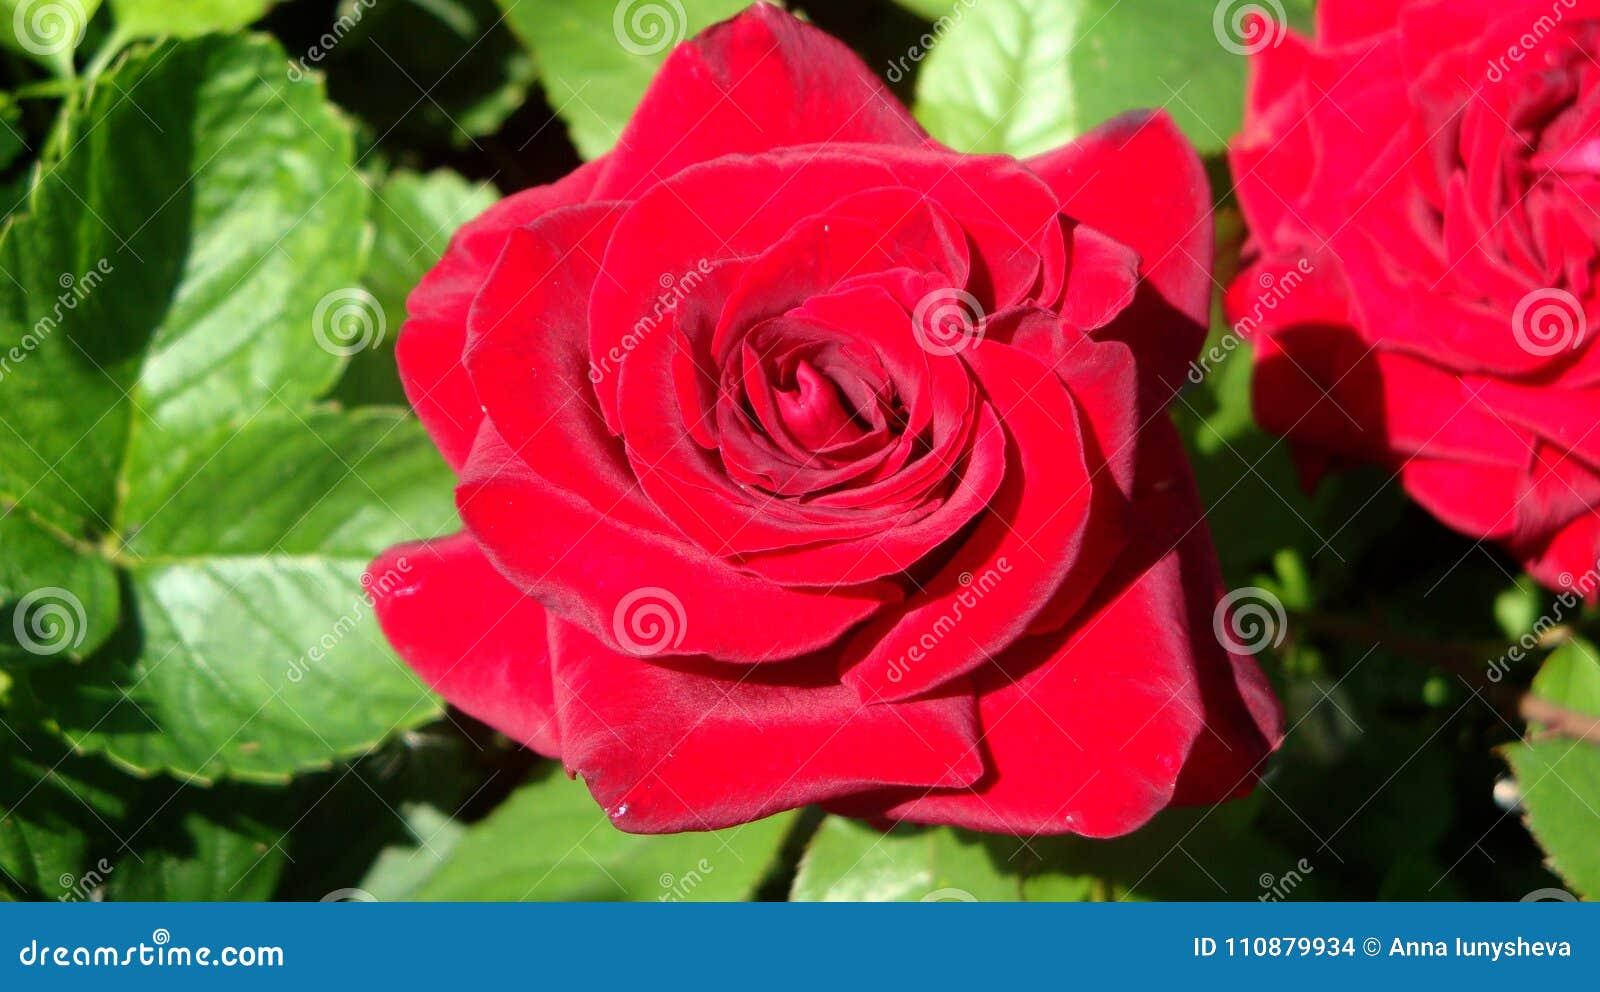 Red roses symbolize love